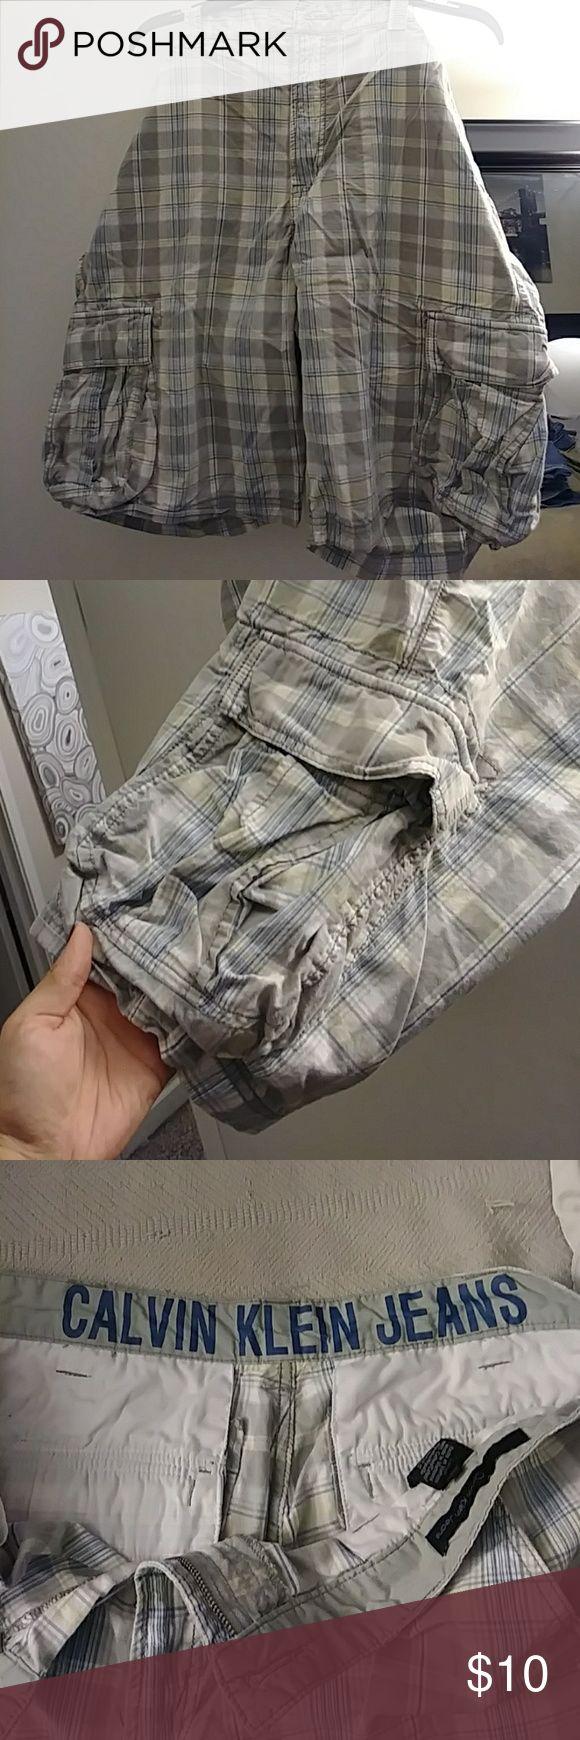 Khaki shorts Good condition cargo khaki shorts for men Calvin Klein Jeans Shorts Cargo